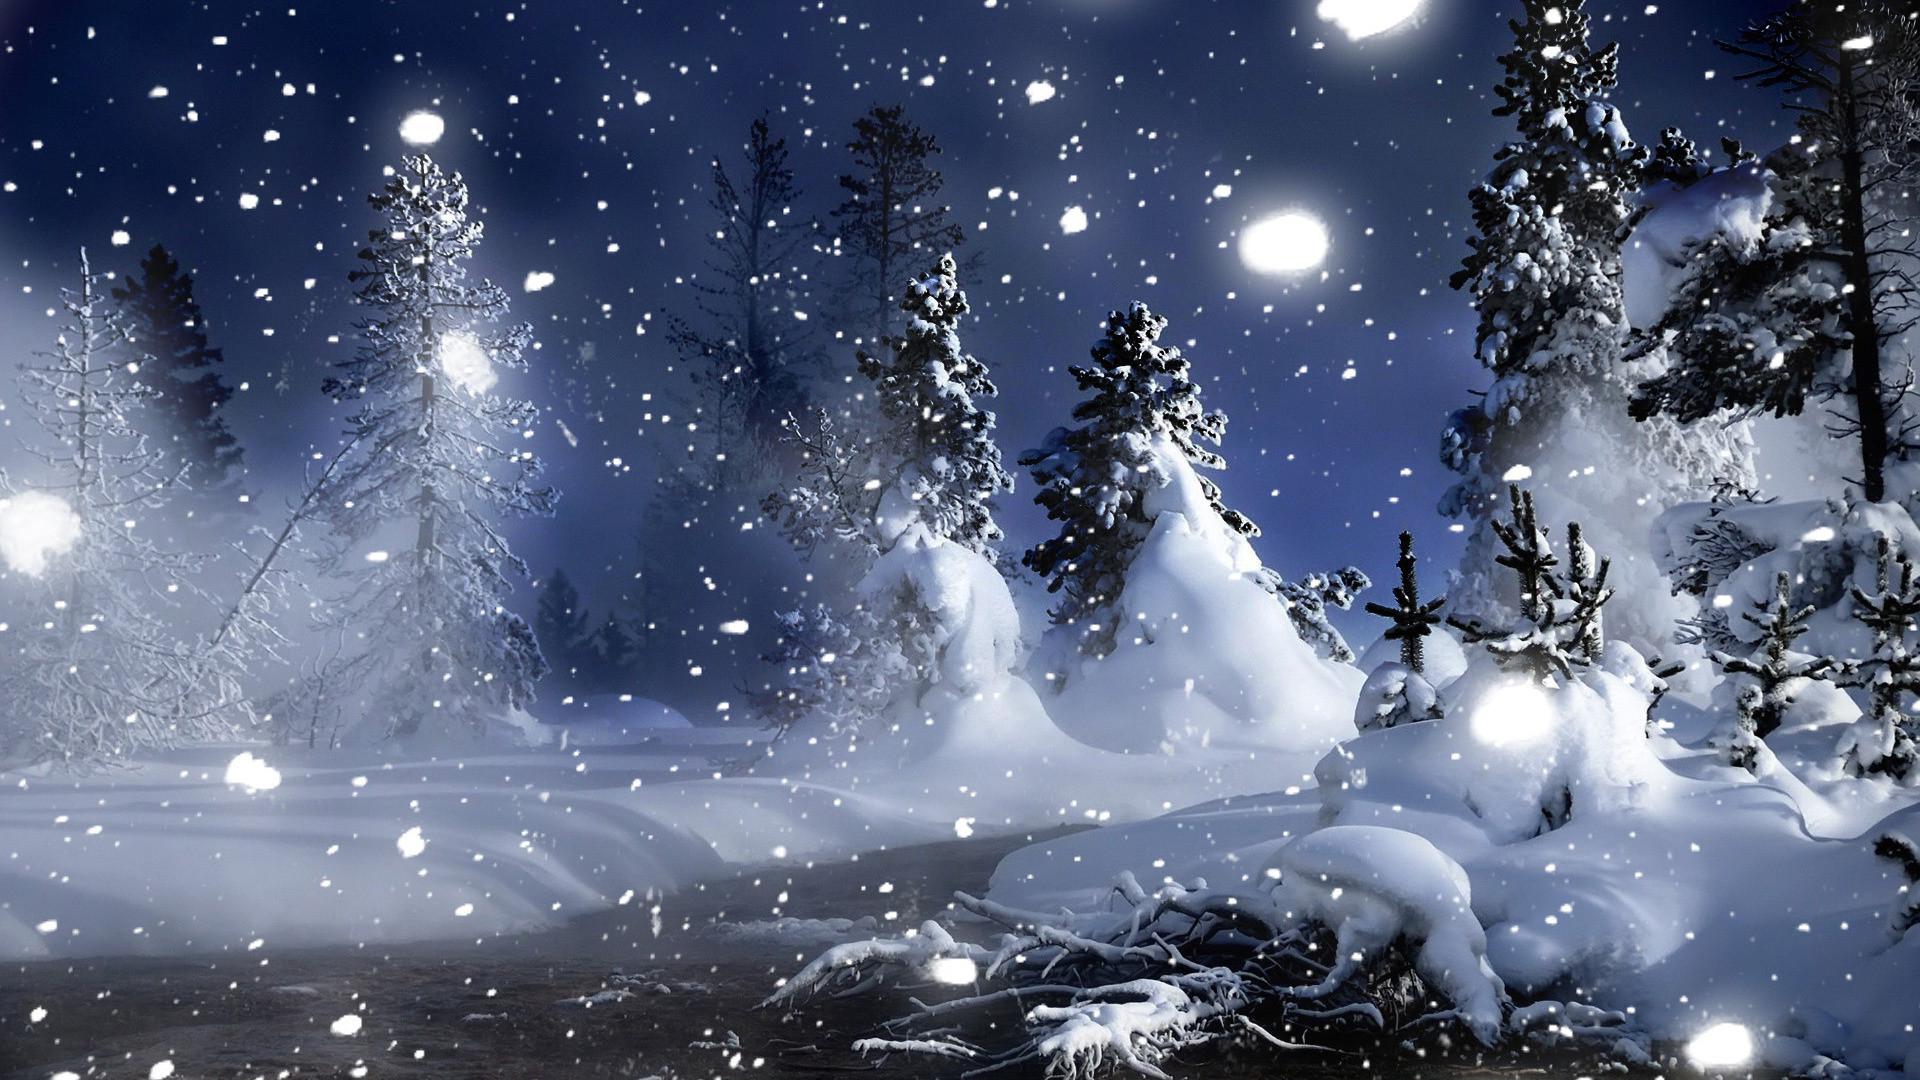 3D Winter Night Snow Desktop Wallpaper